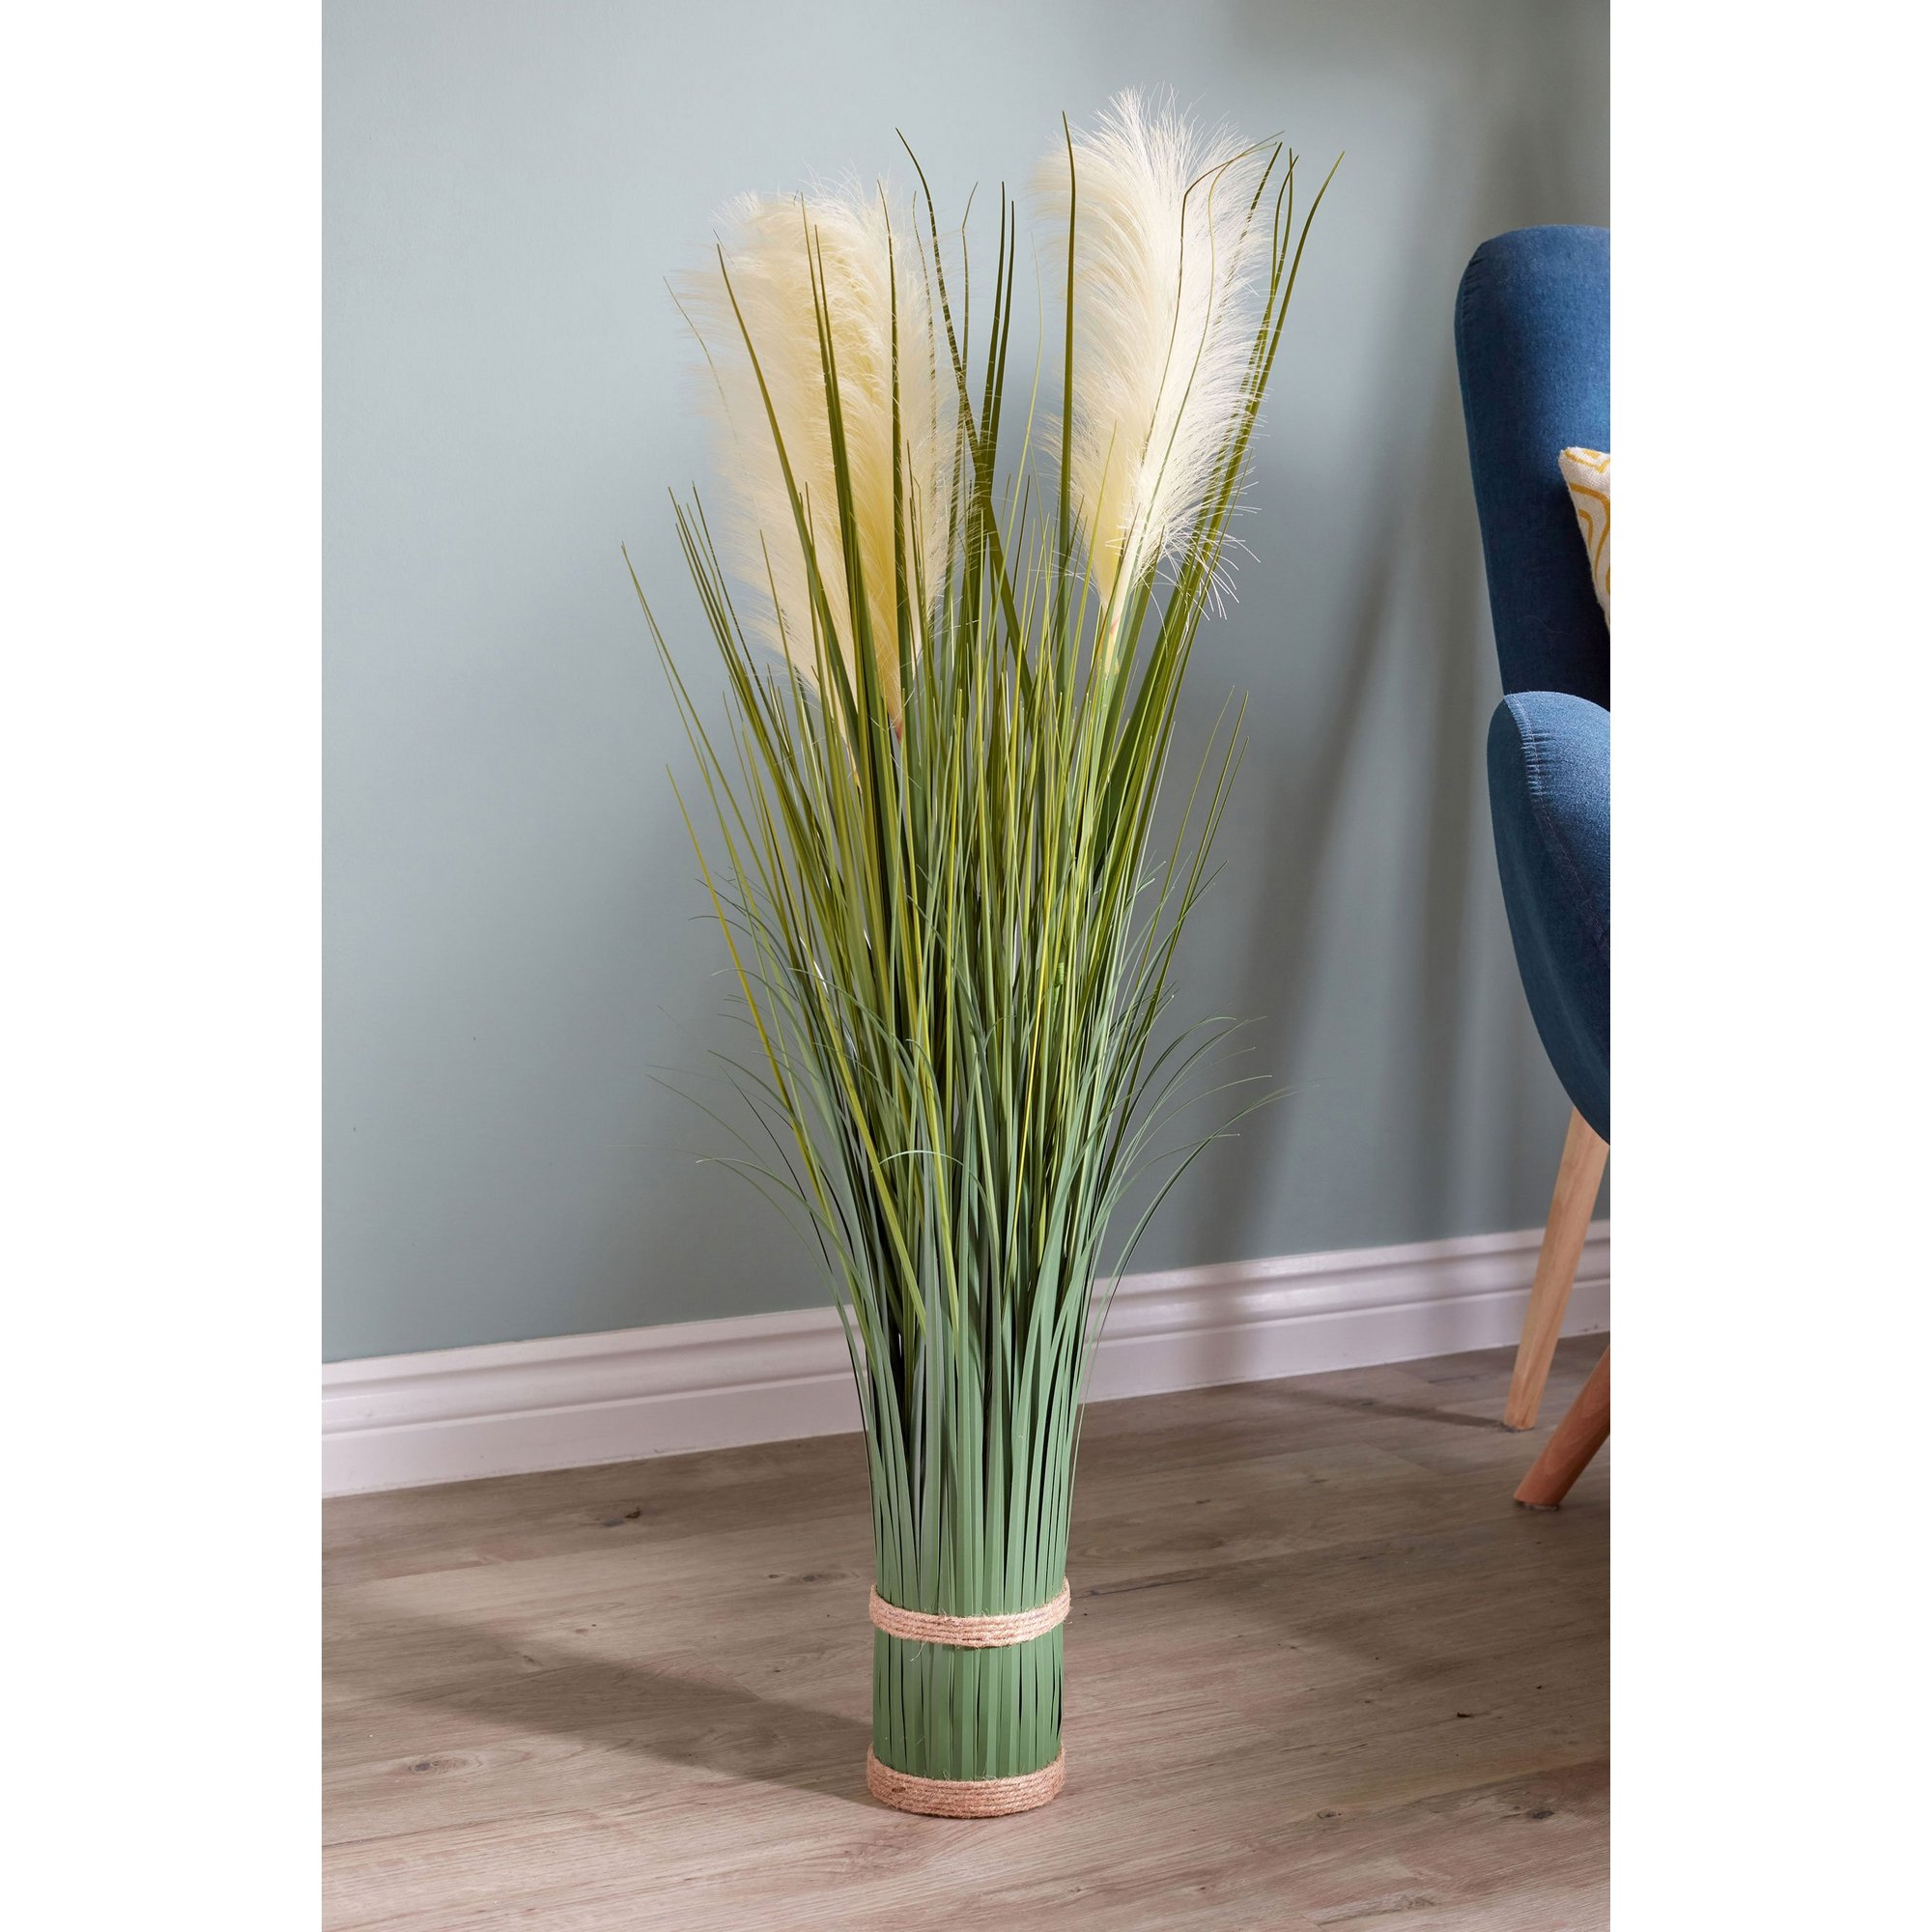 Image of Faux Bouquet White Pampas